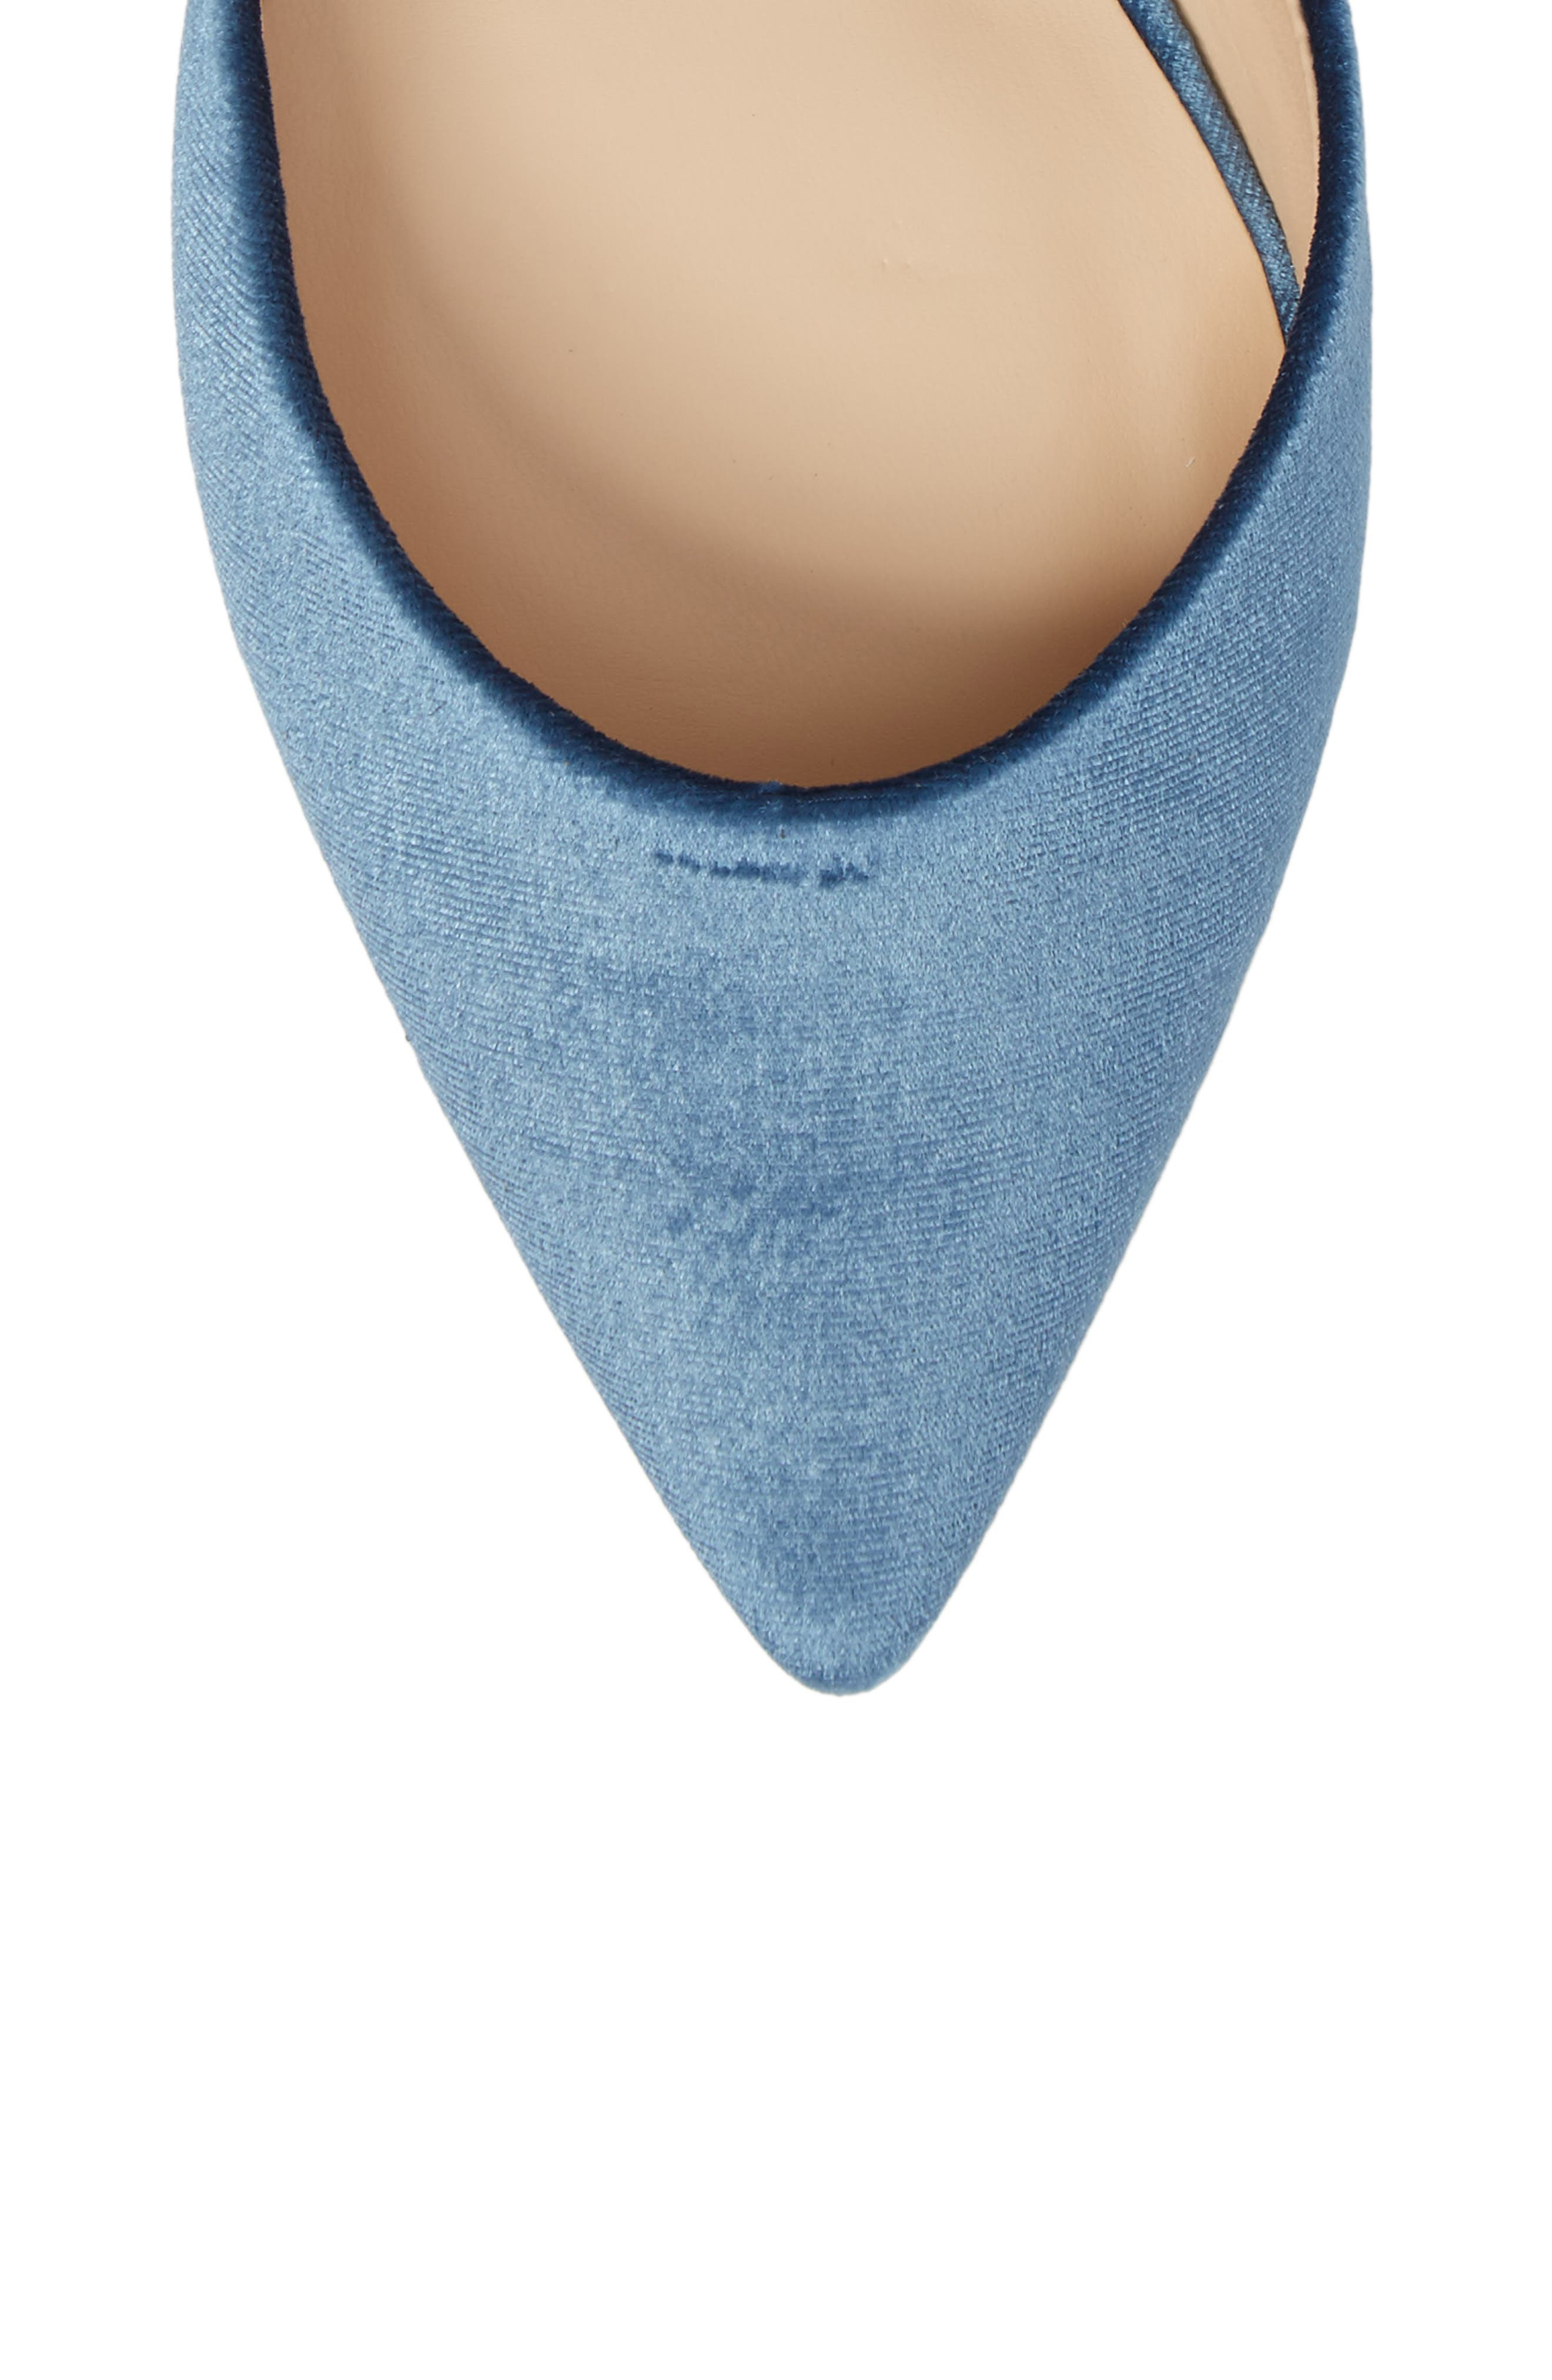 Teena d'Orsay Flat with Ties,                             Alternate thumbnail 5, color,                             Glacier Blue